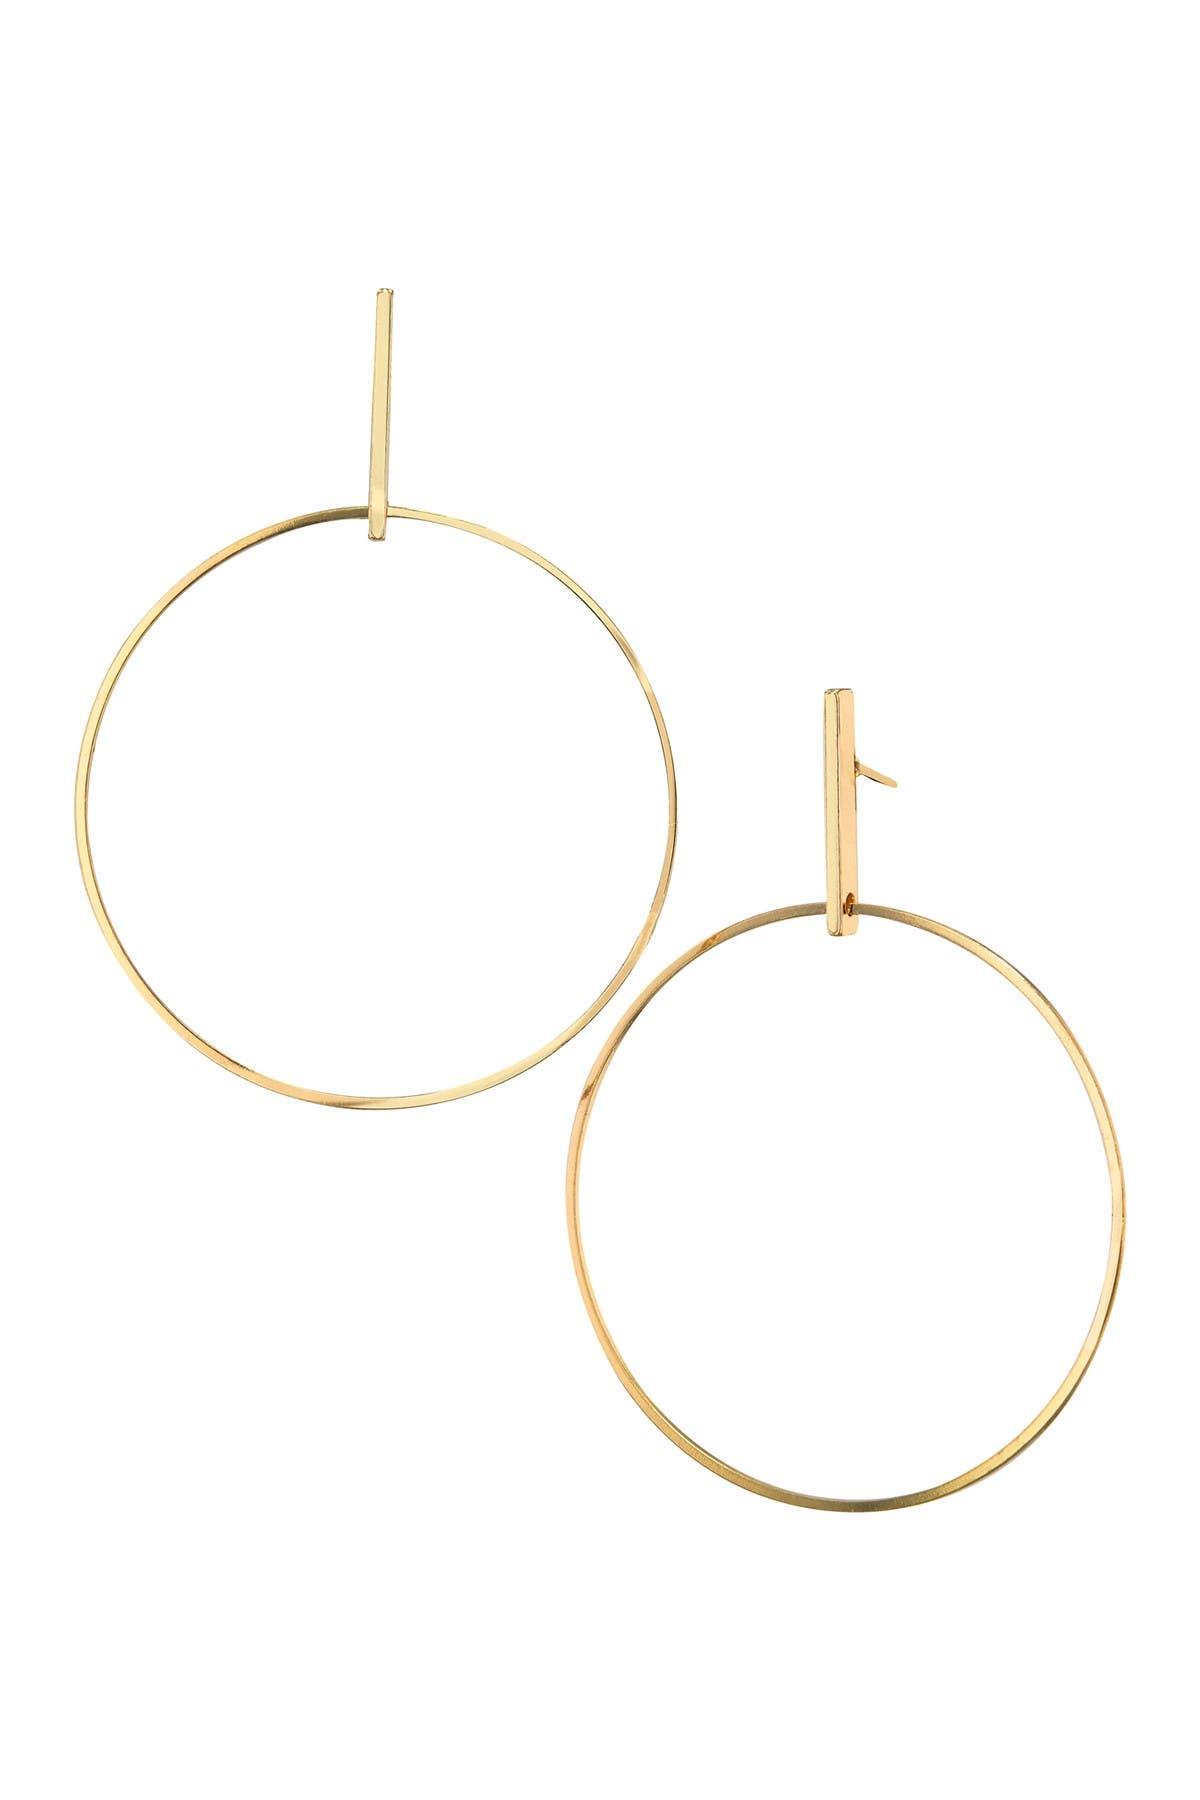 Image of Savvy Cie 14K Gold Plated Geometric Drop Earrings